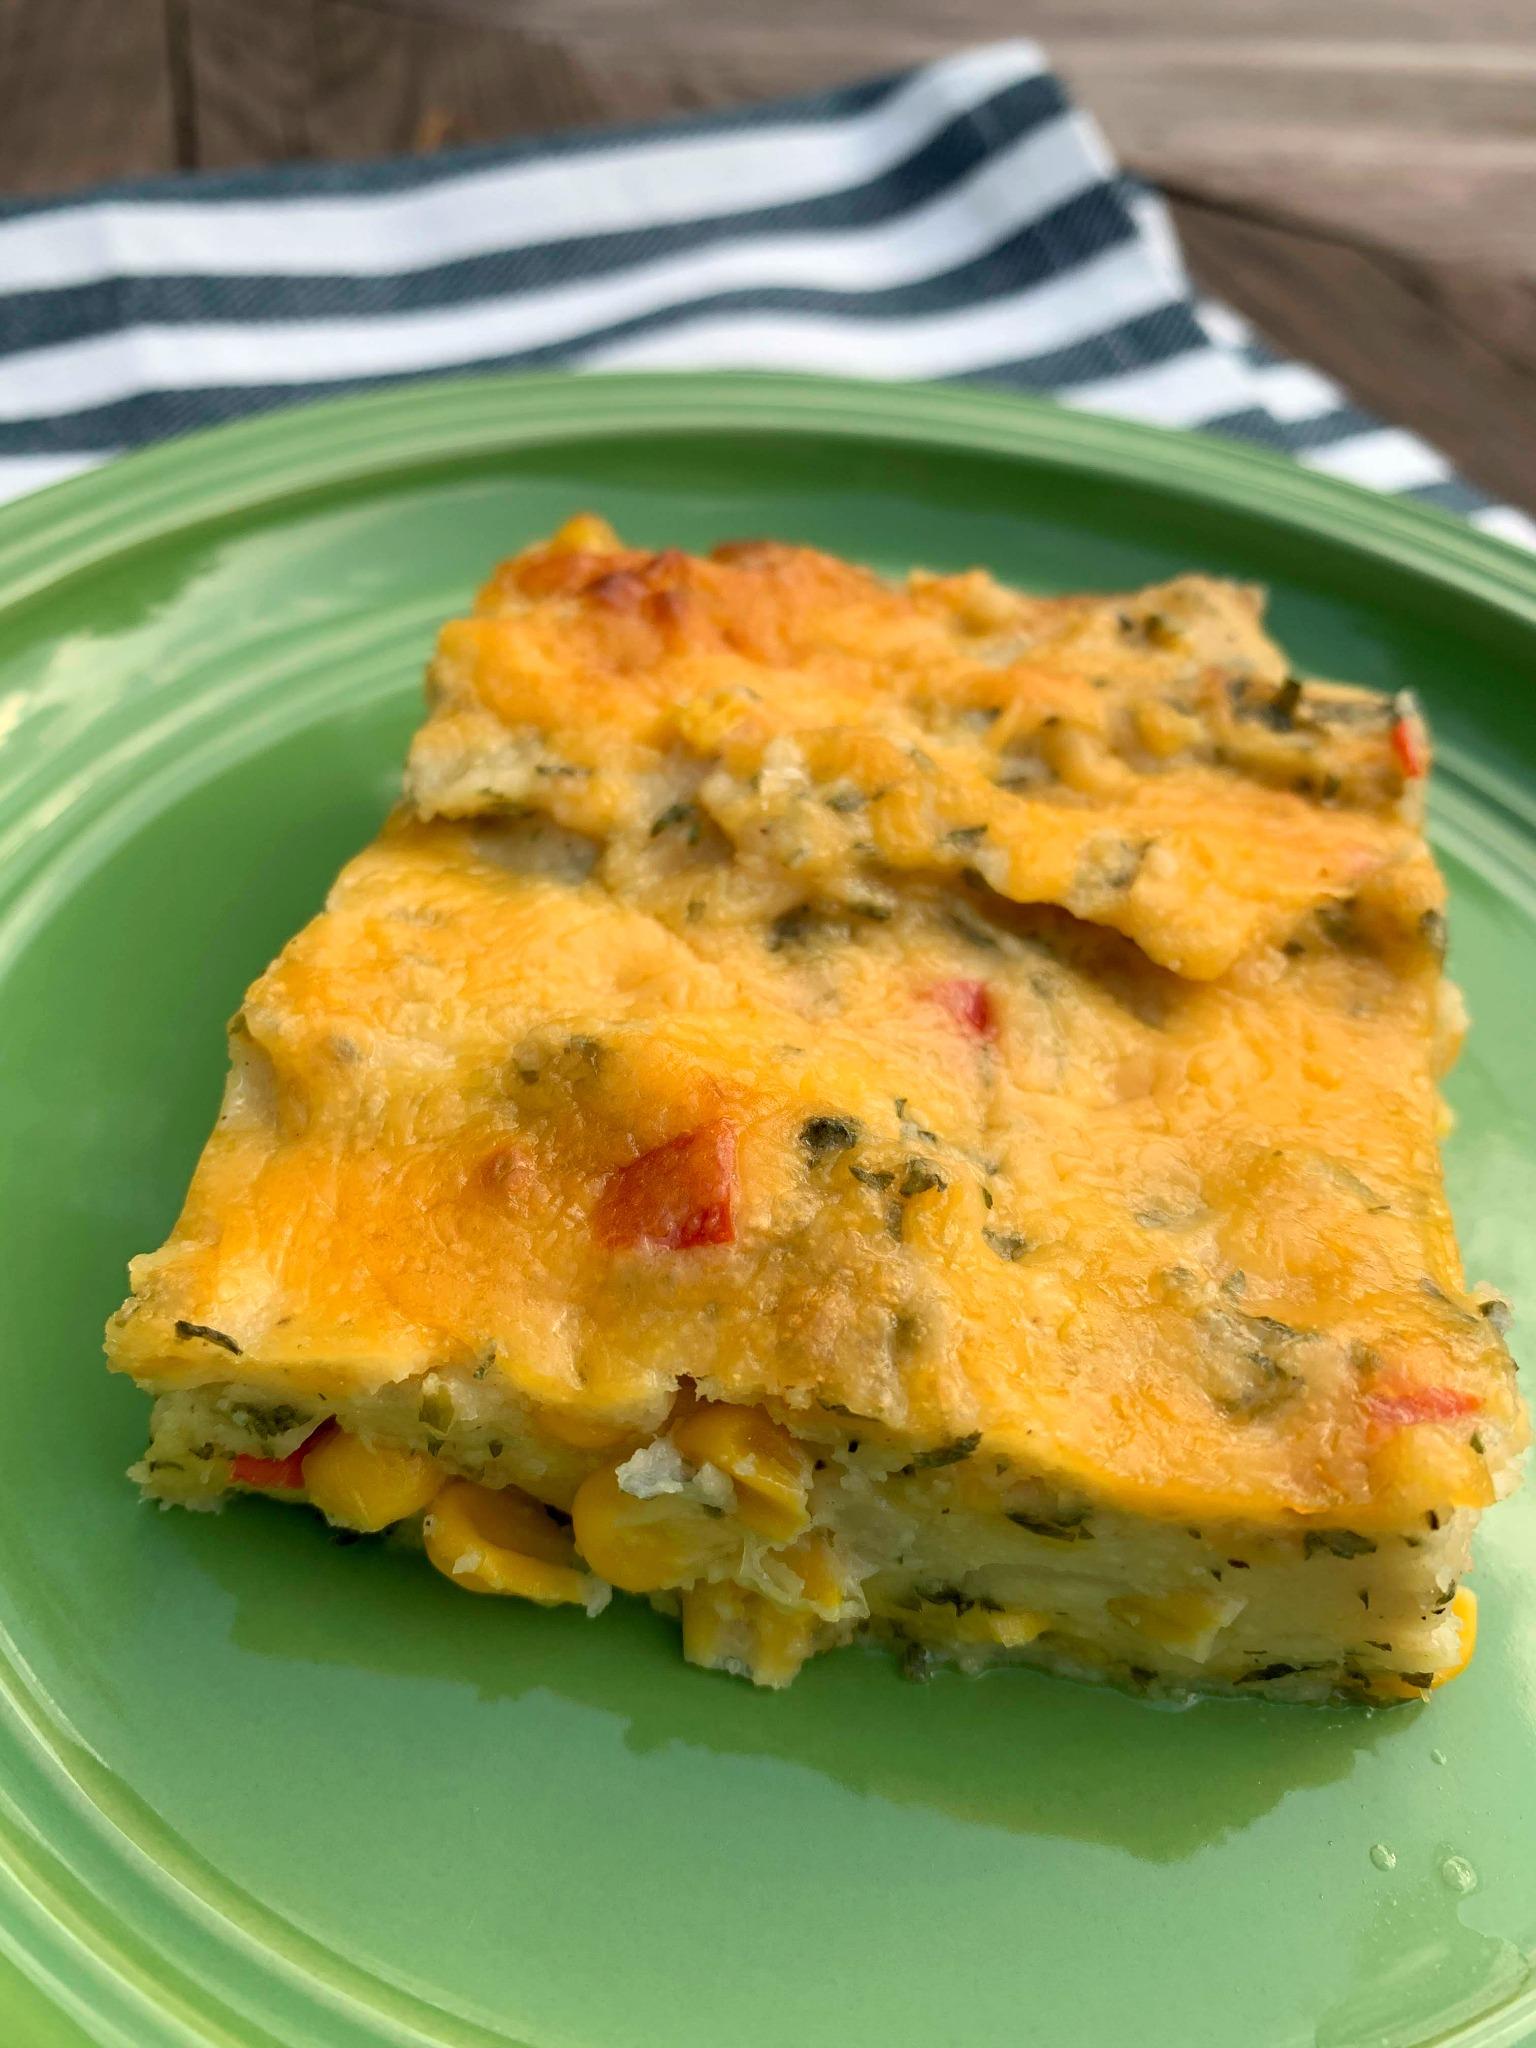 a slice of corn pie casserole on a green plate